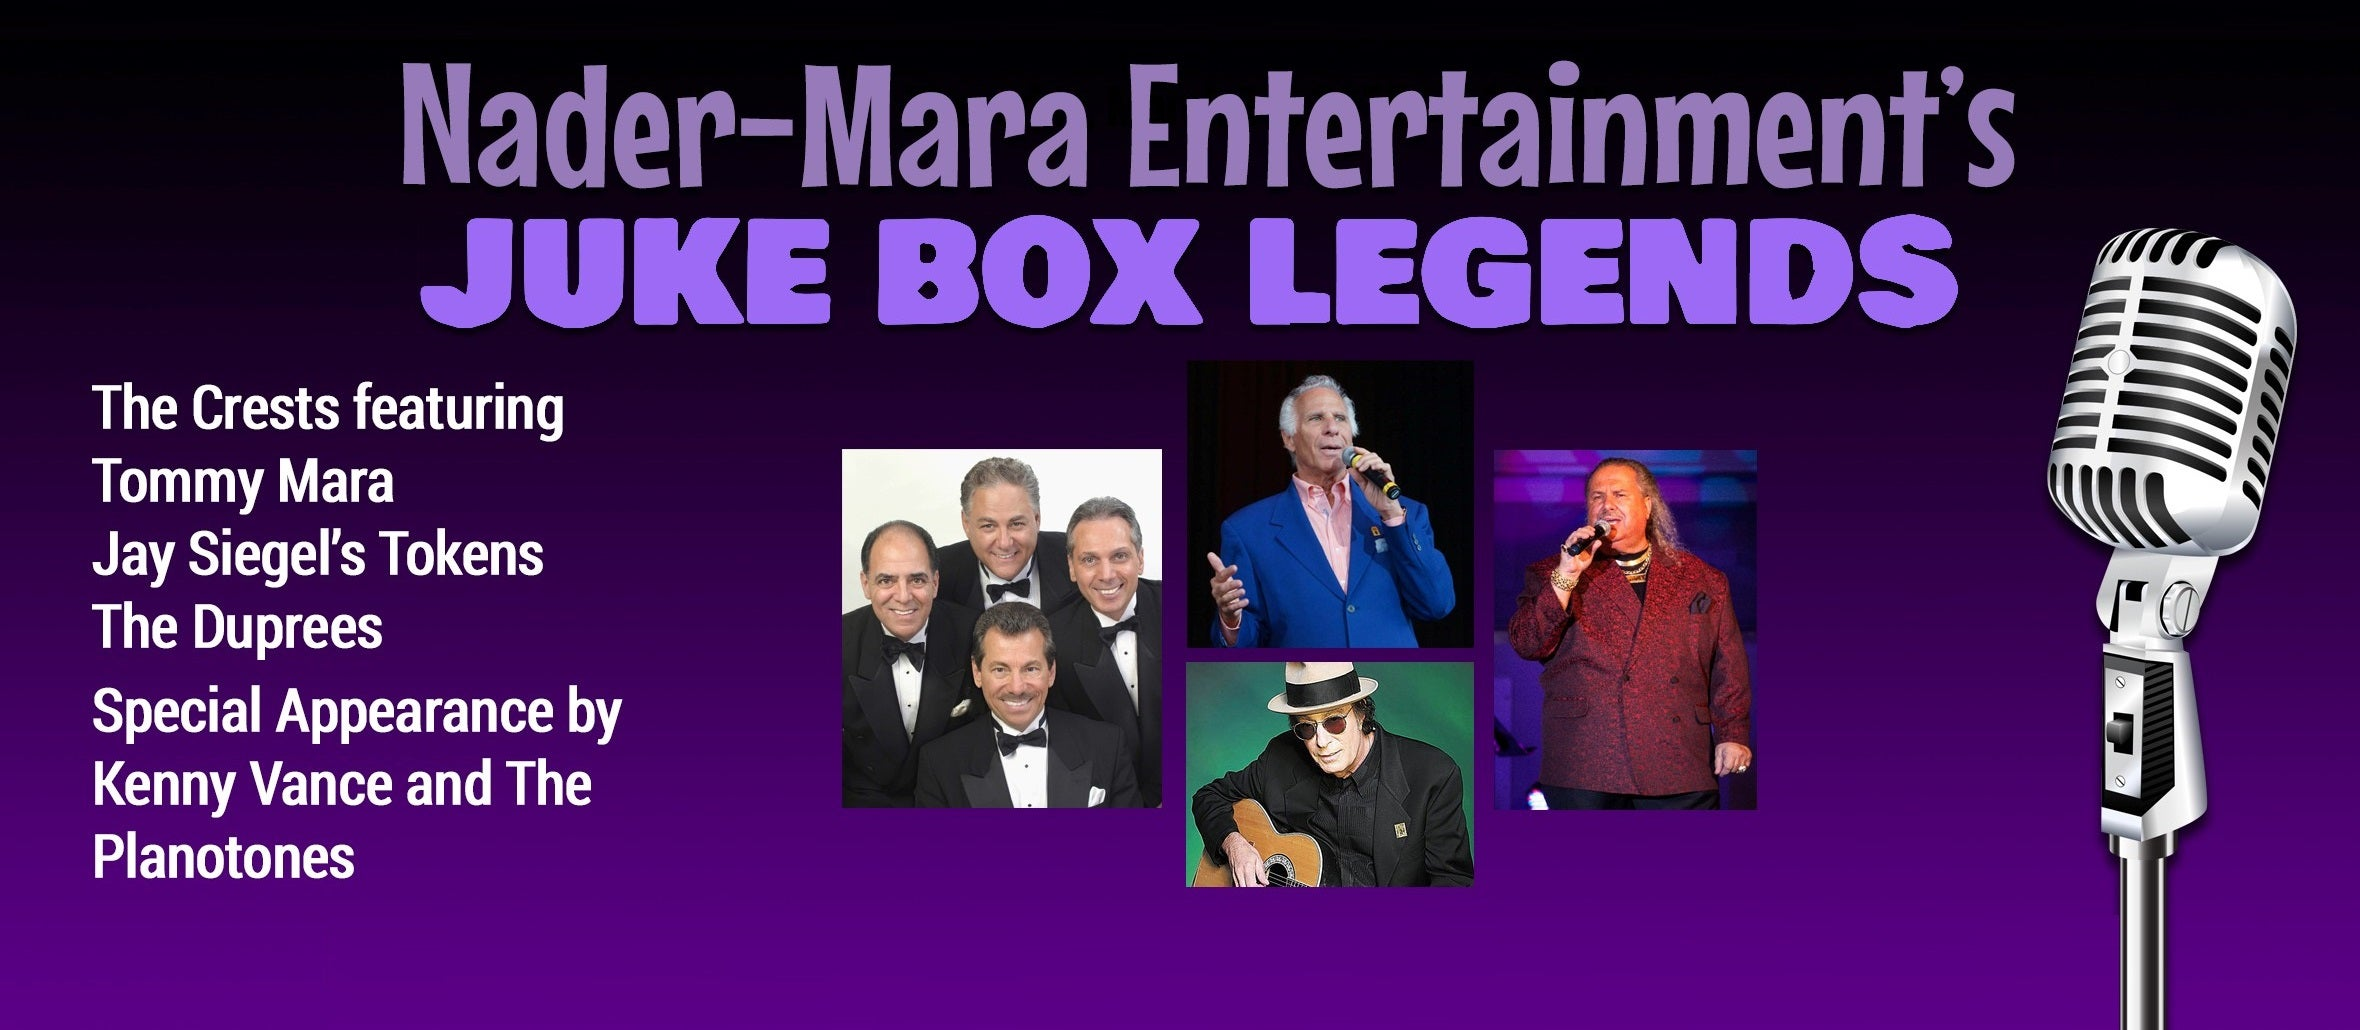 Nader-Mara Juke Box Legends